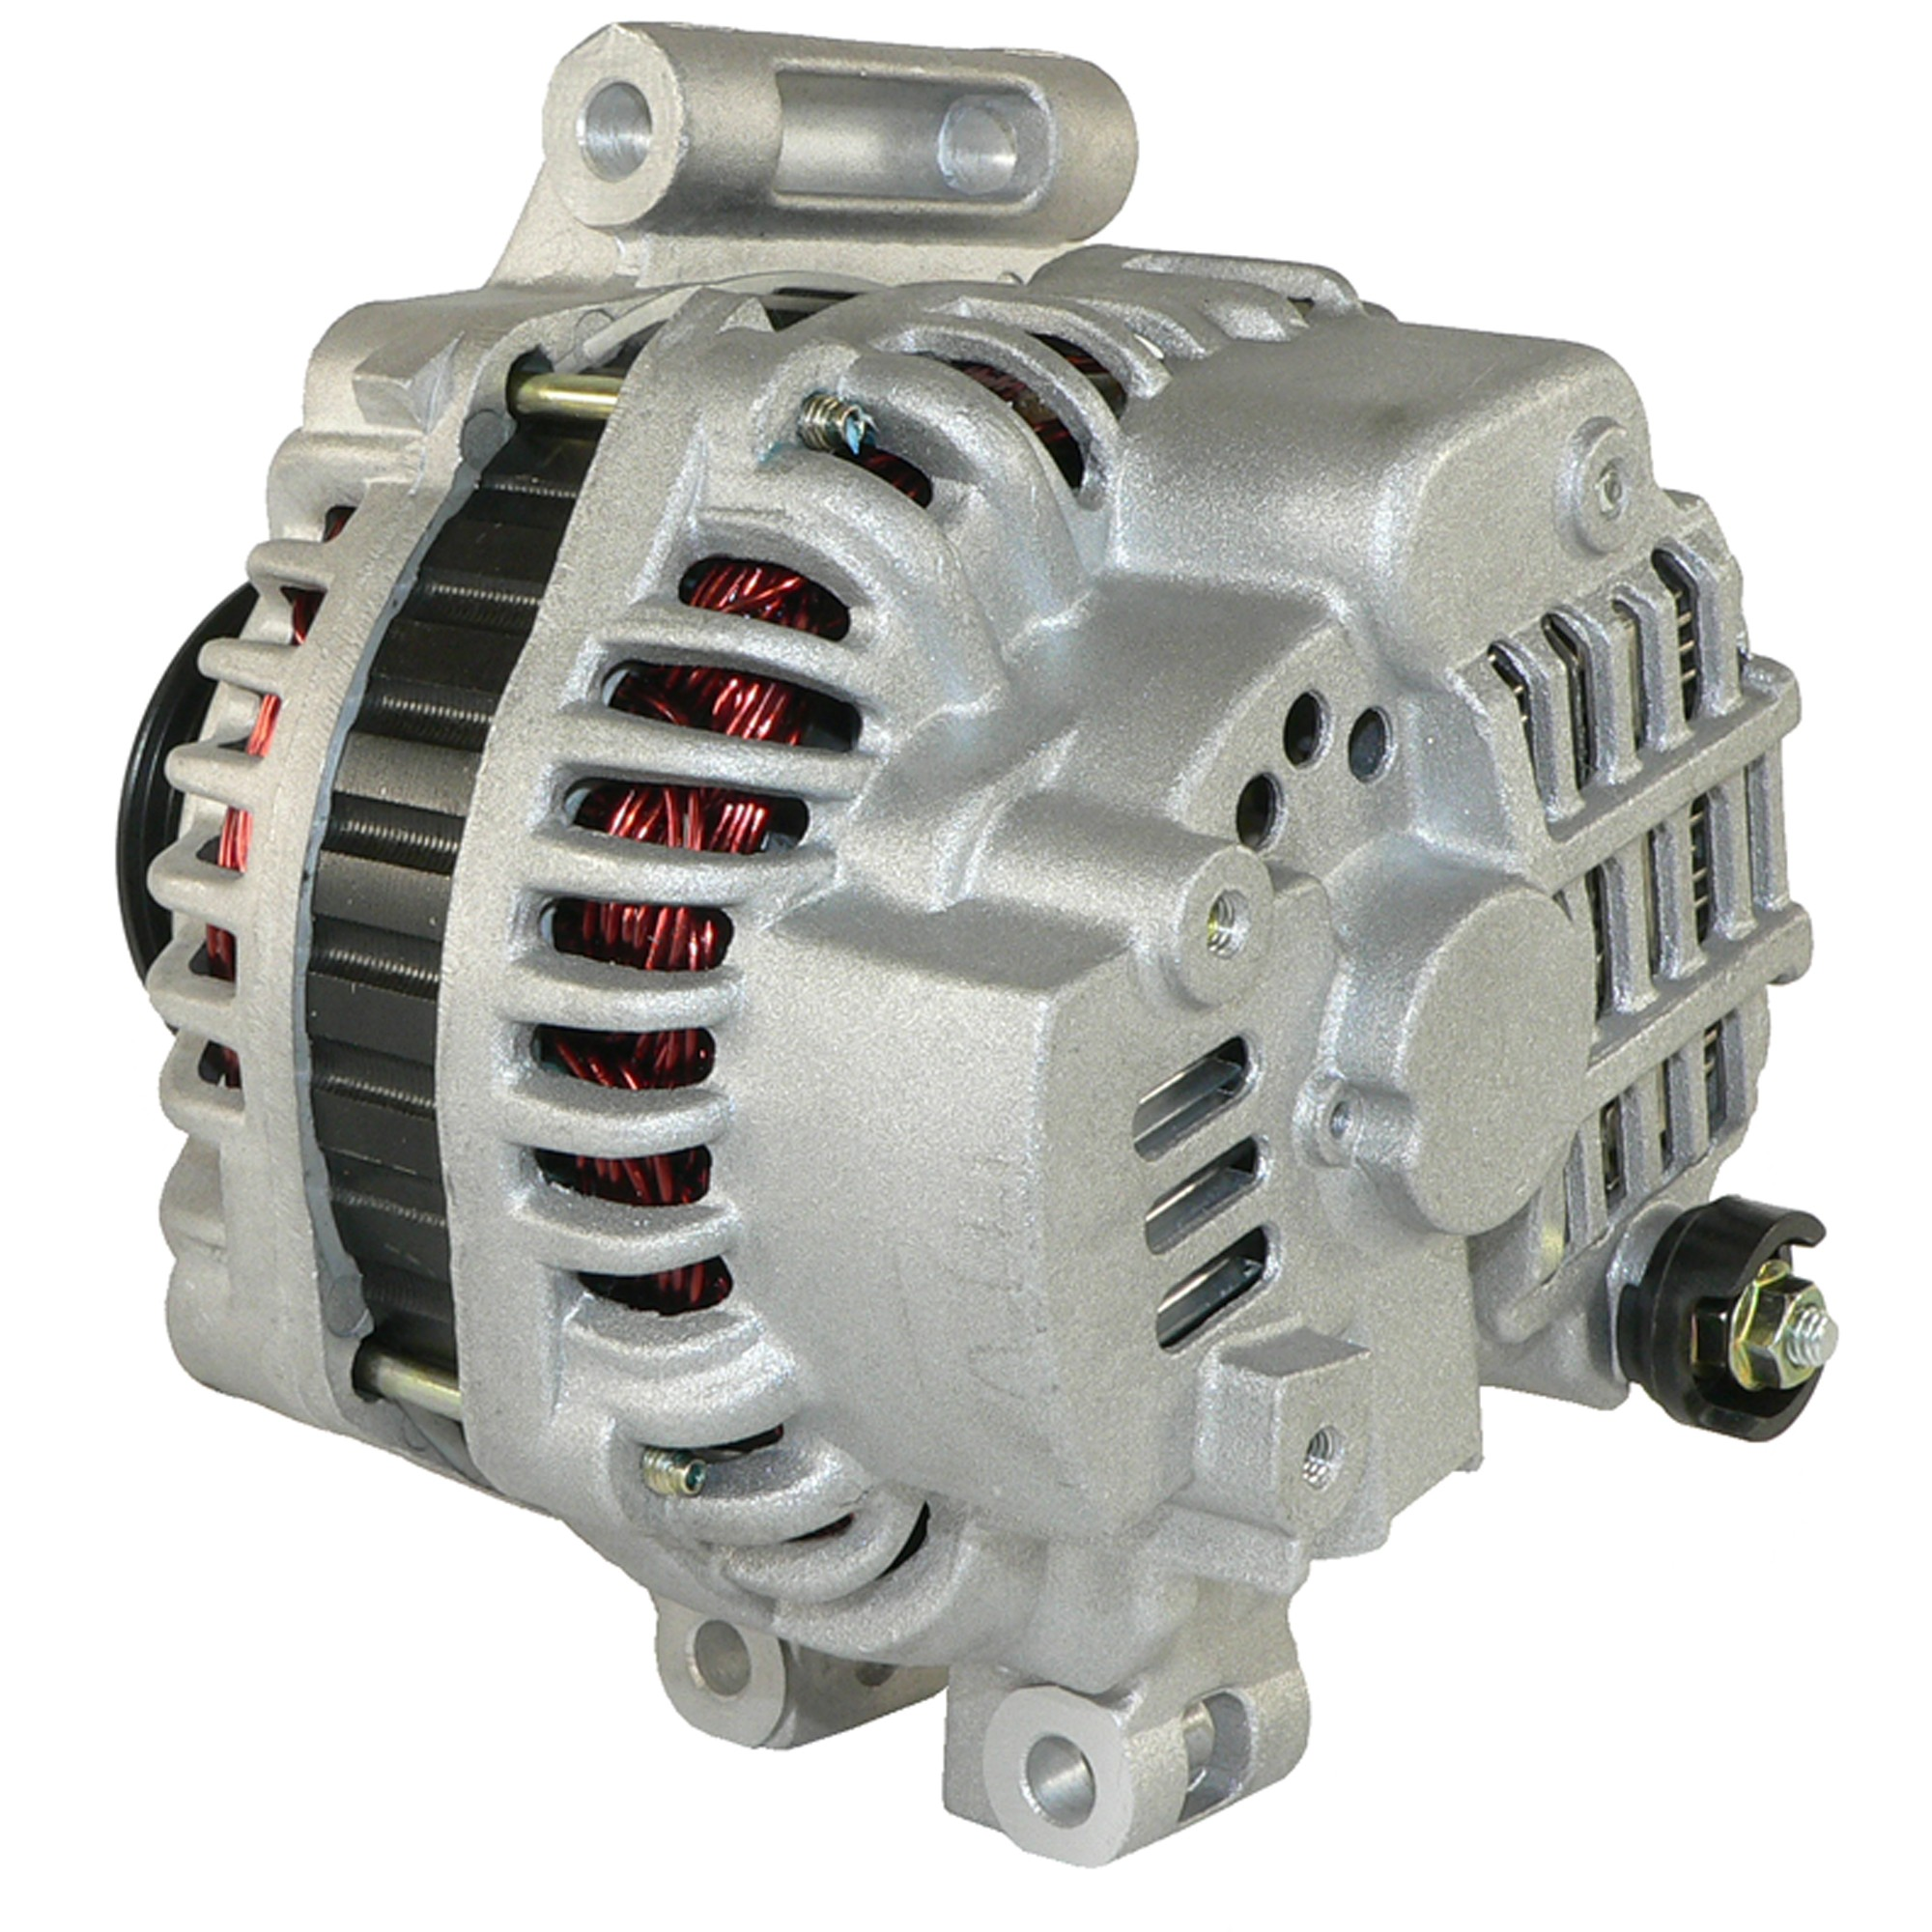 ALTERNATOR FOR 2.0L ACURA RSX 02-06 /& 2.4L HONDA CR-V CRV 2002-06 31100-PNC-004